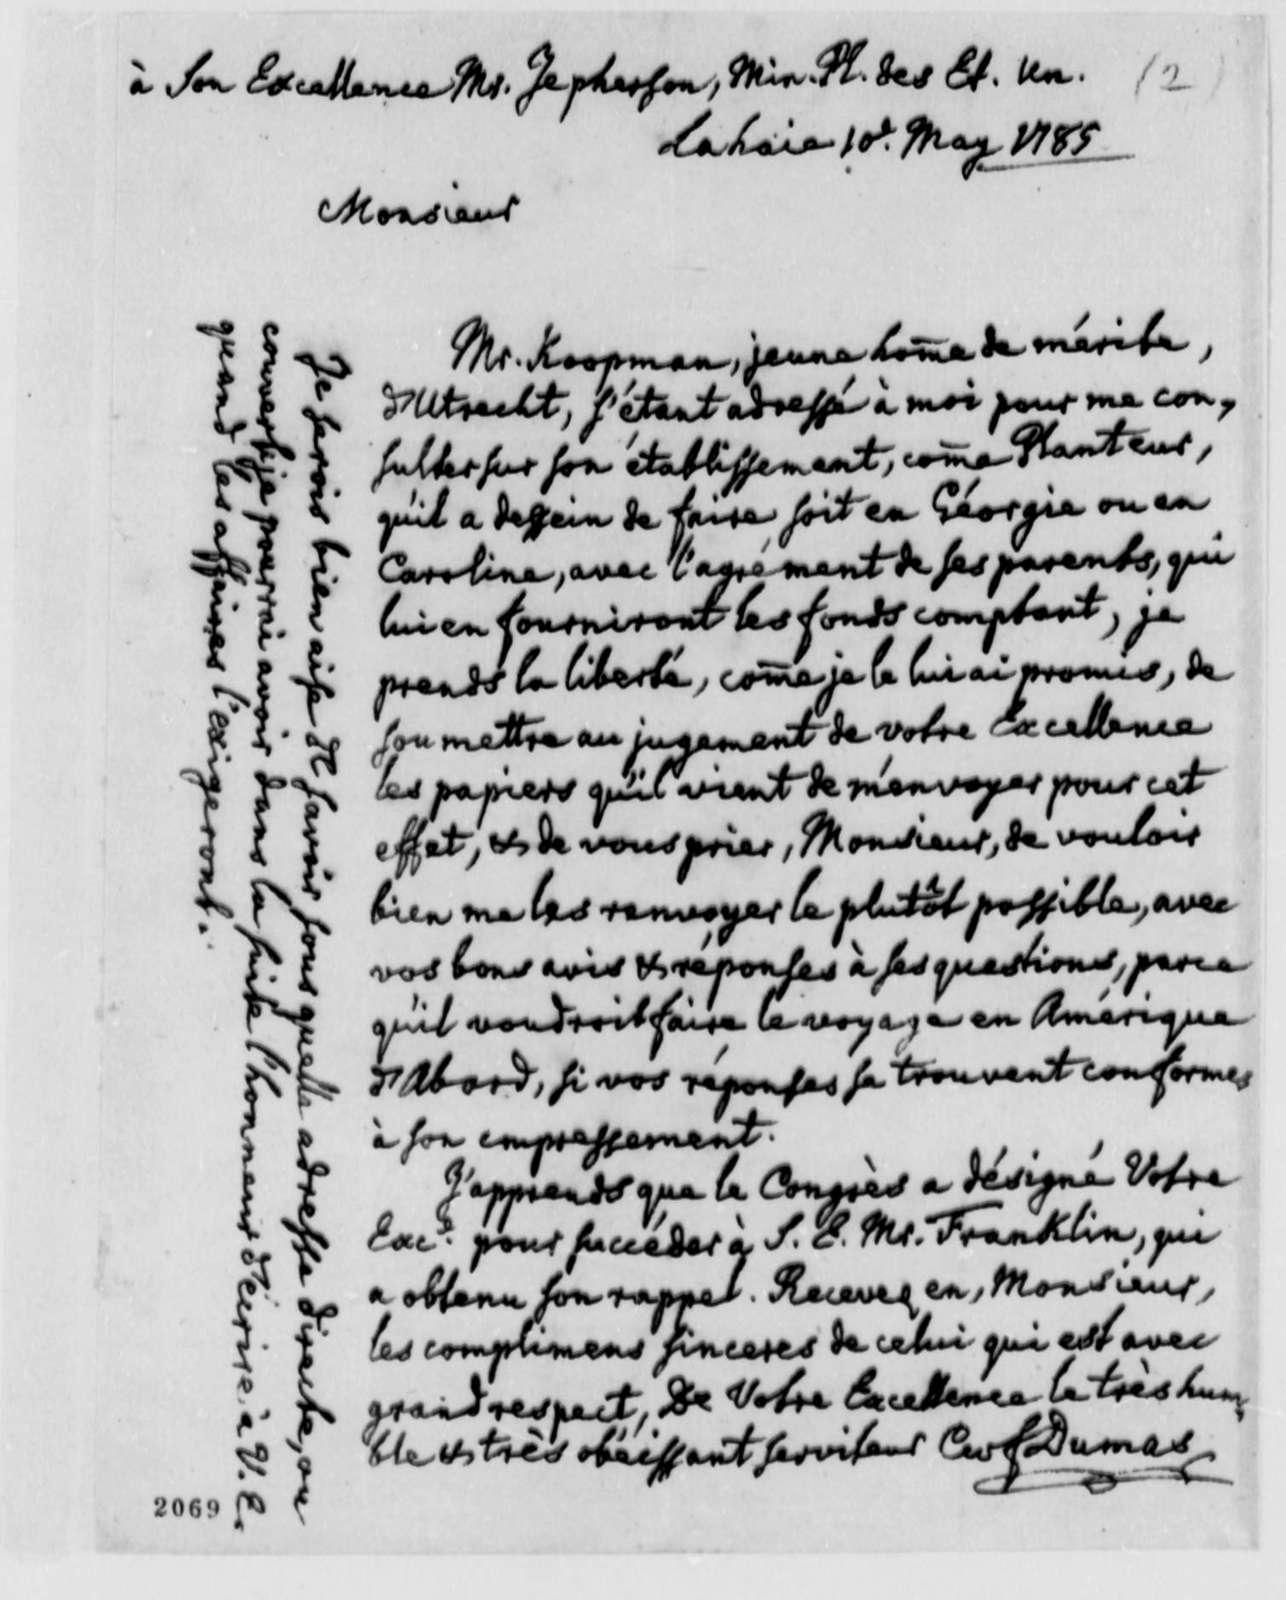 Charles William Frederic Dumas to Thomas Jefferson, May 10, 1785